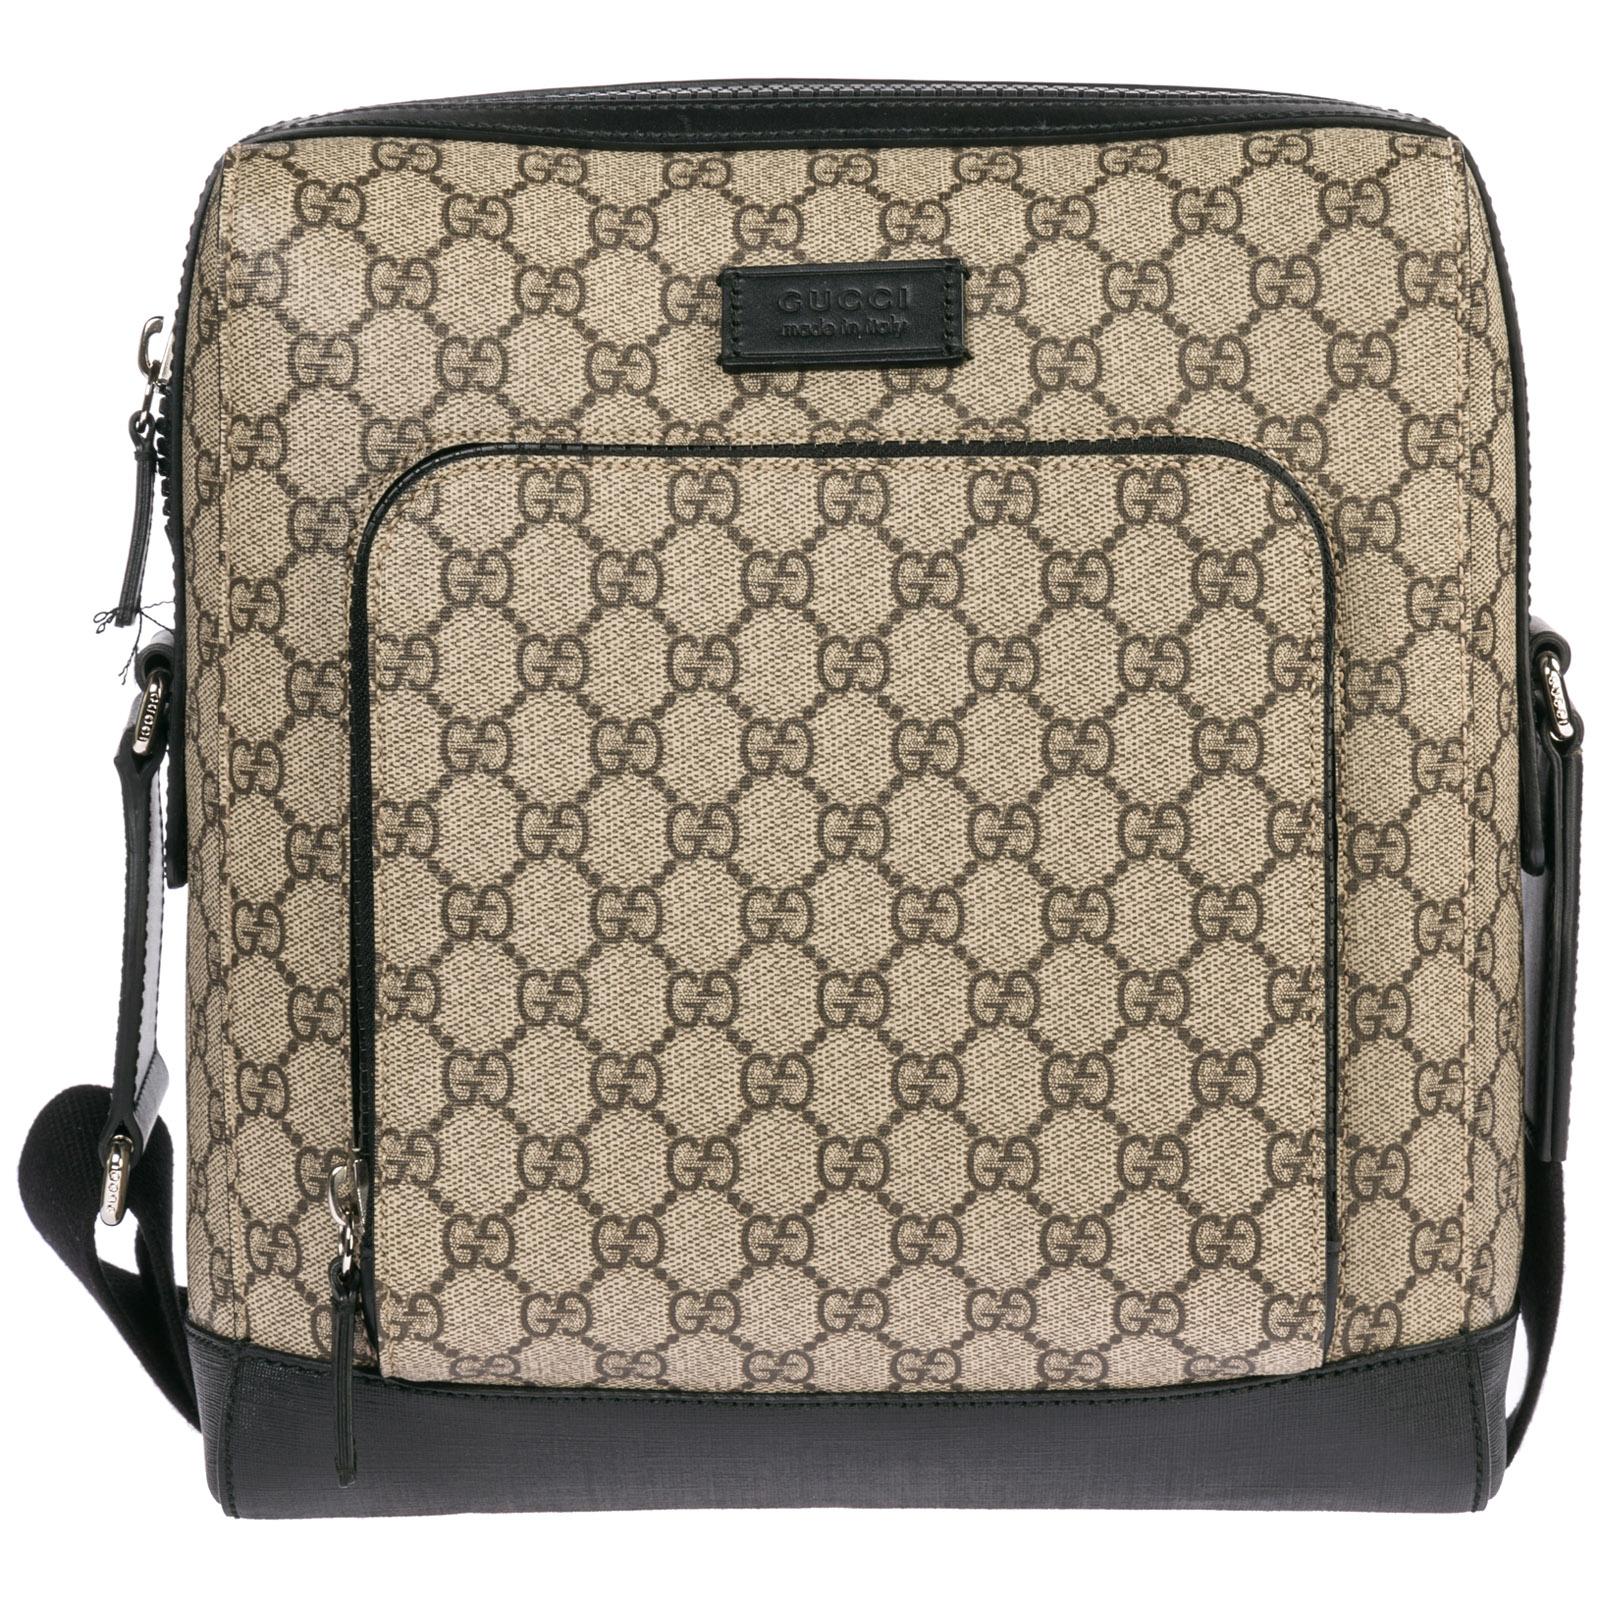 6a843a173df Gucci Men s cross-body messenger shoulder bag gg supreme